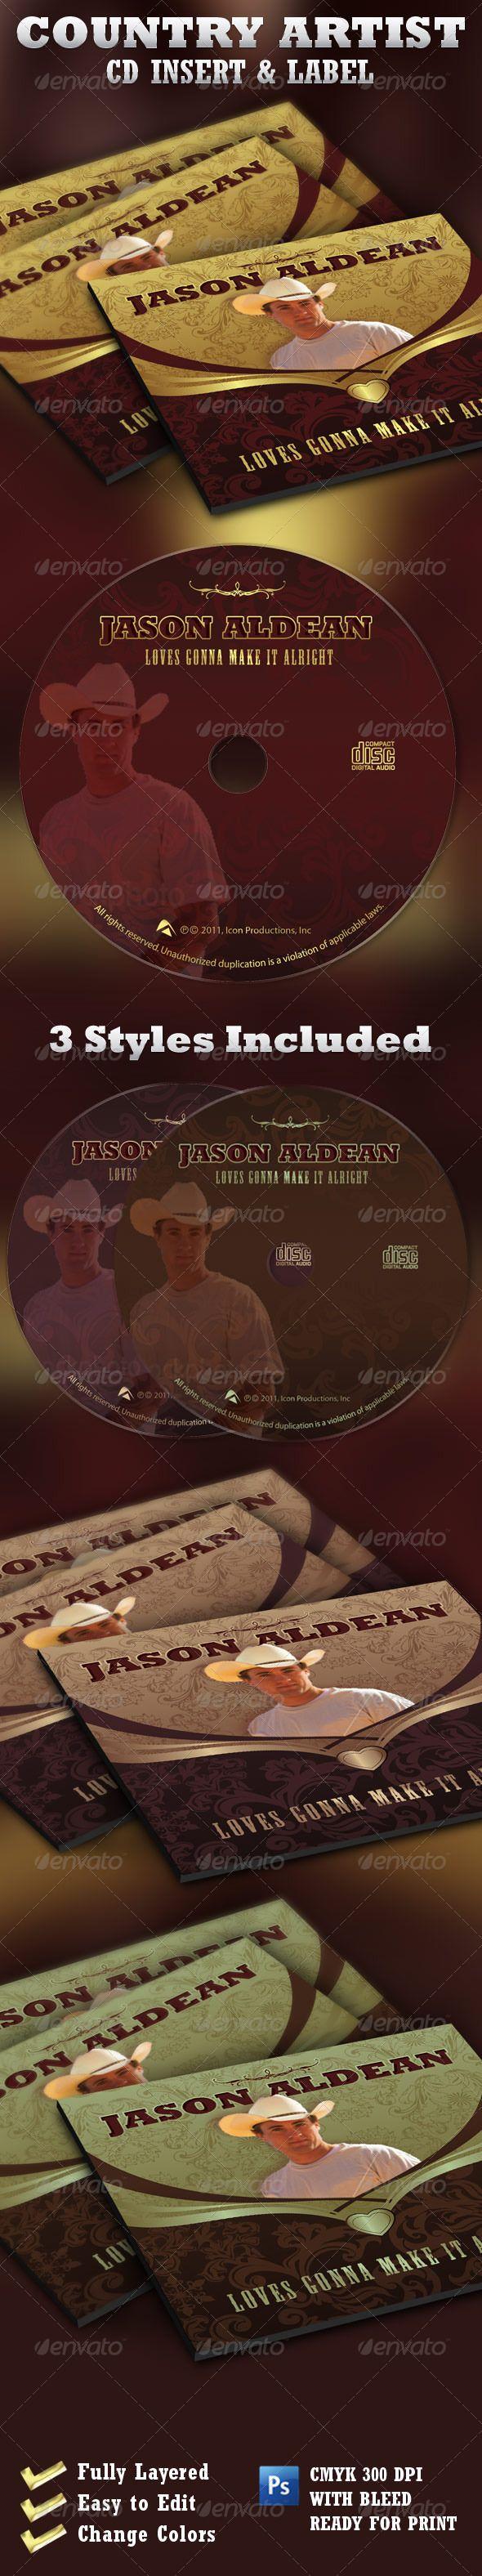 country artist cd label insert template cd dvd artwork print